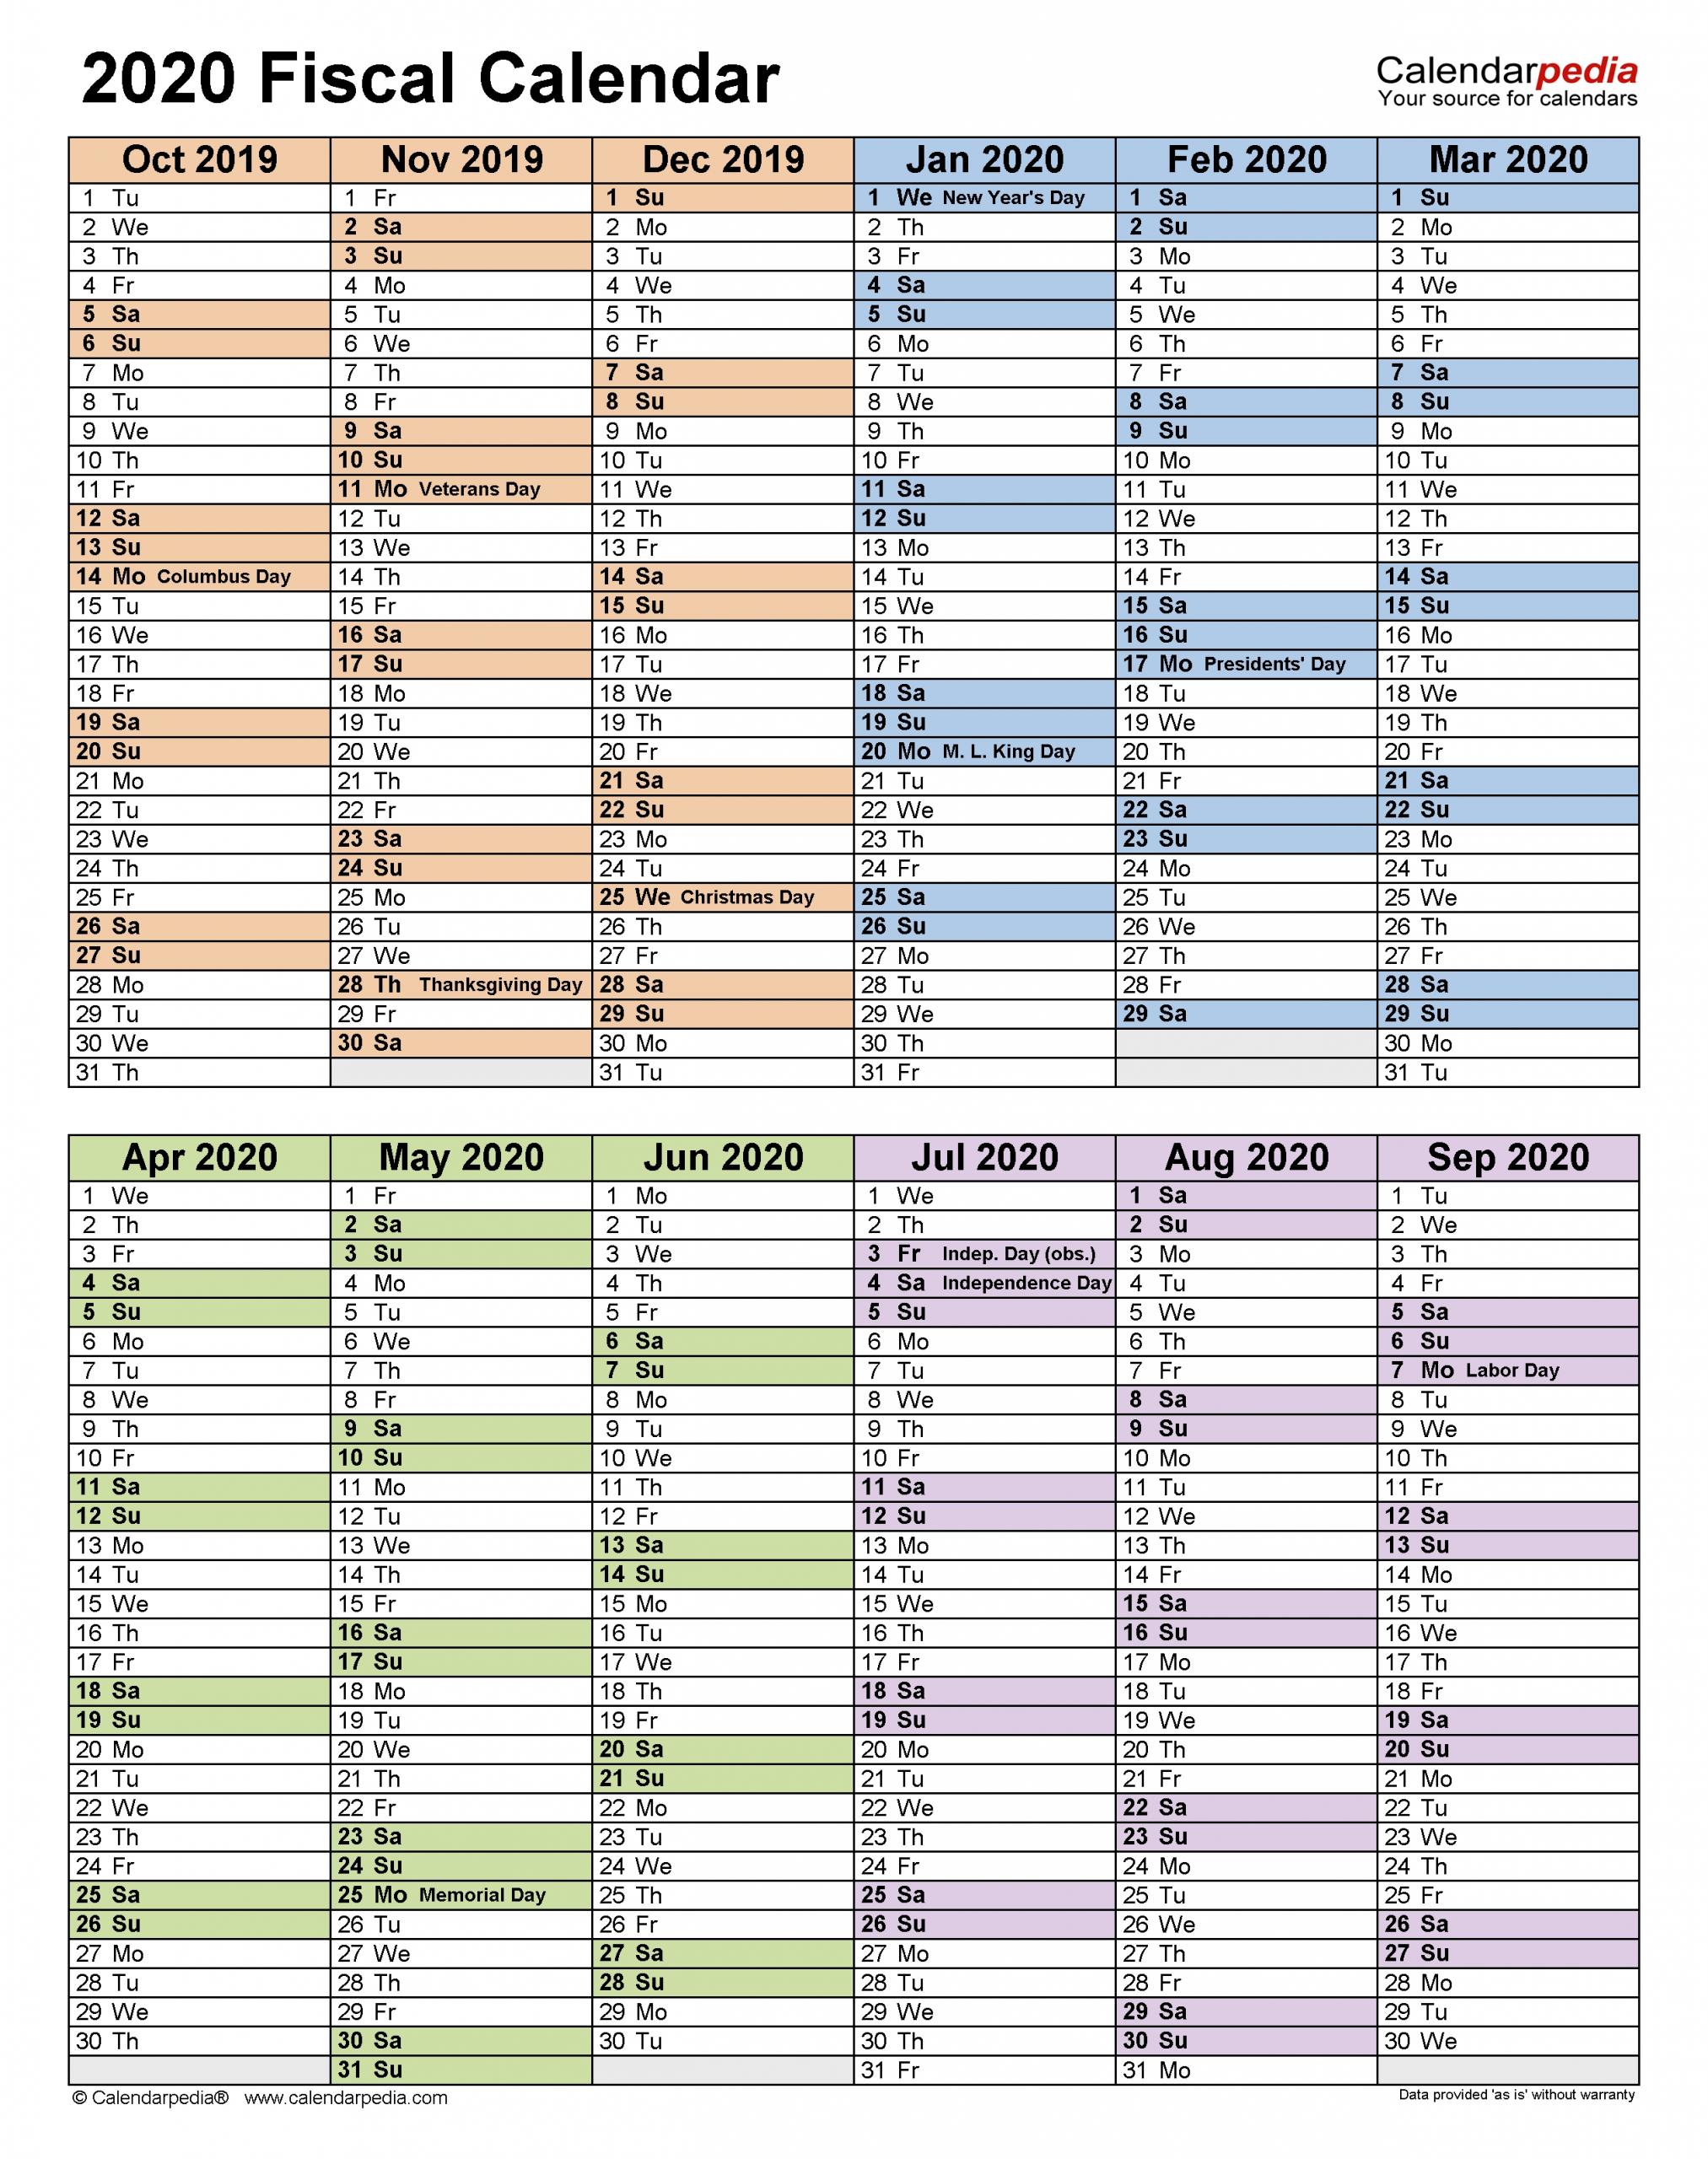 Fiscal Calendars 2020 - Free Printable Pdf Templates  18 19 Financial Year Dates Australia